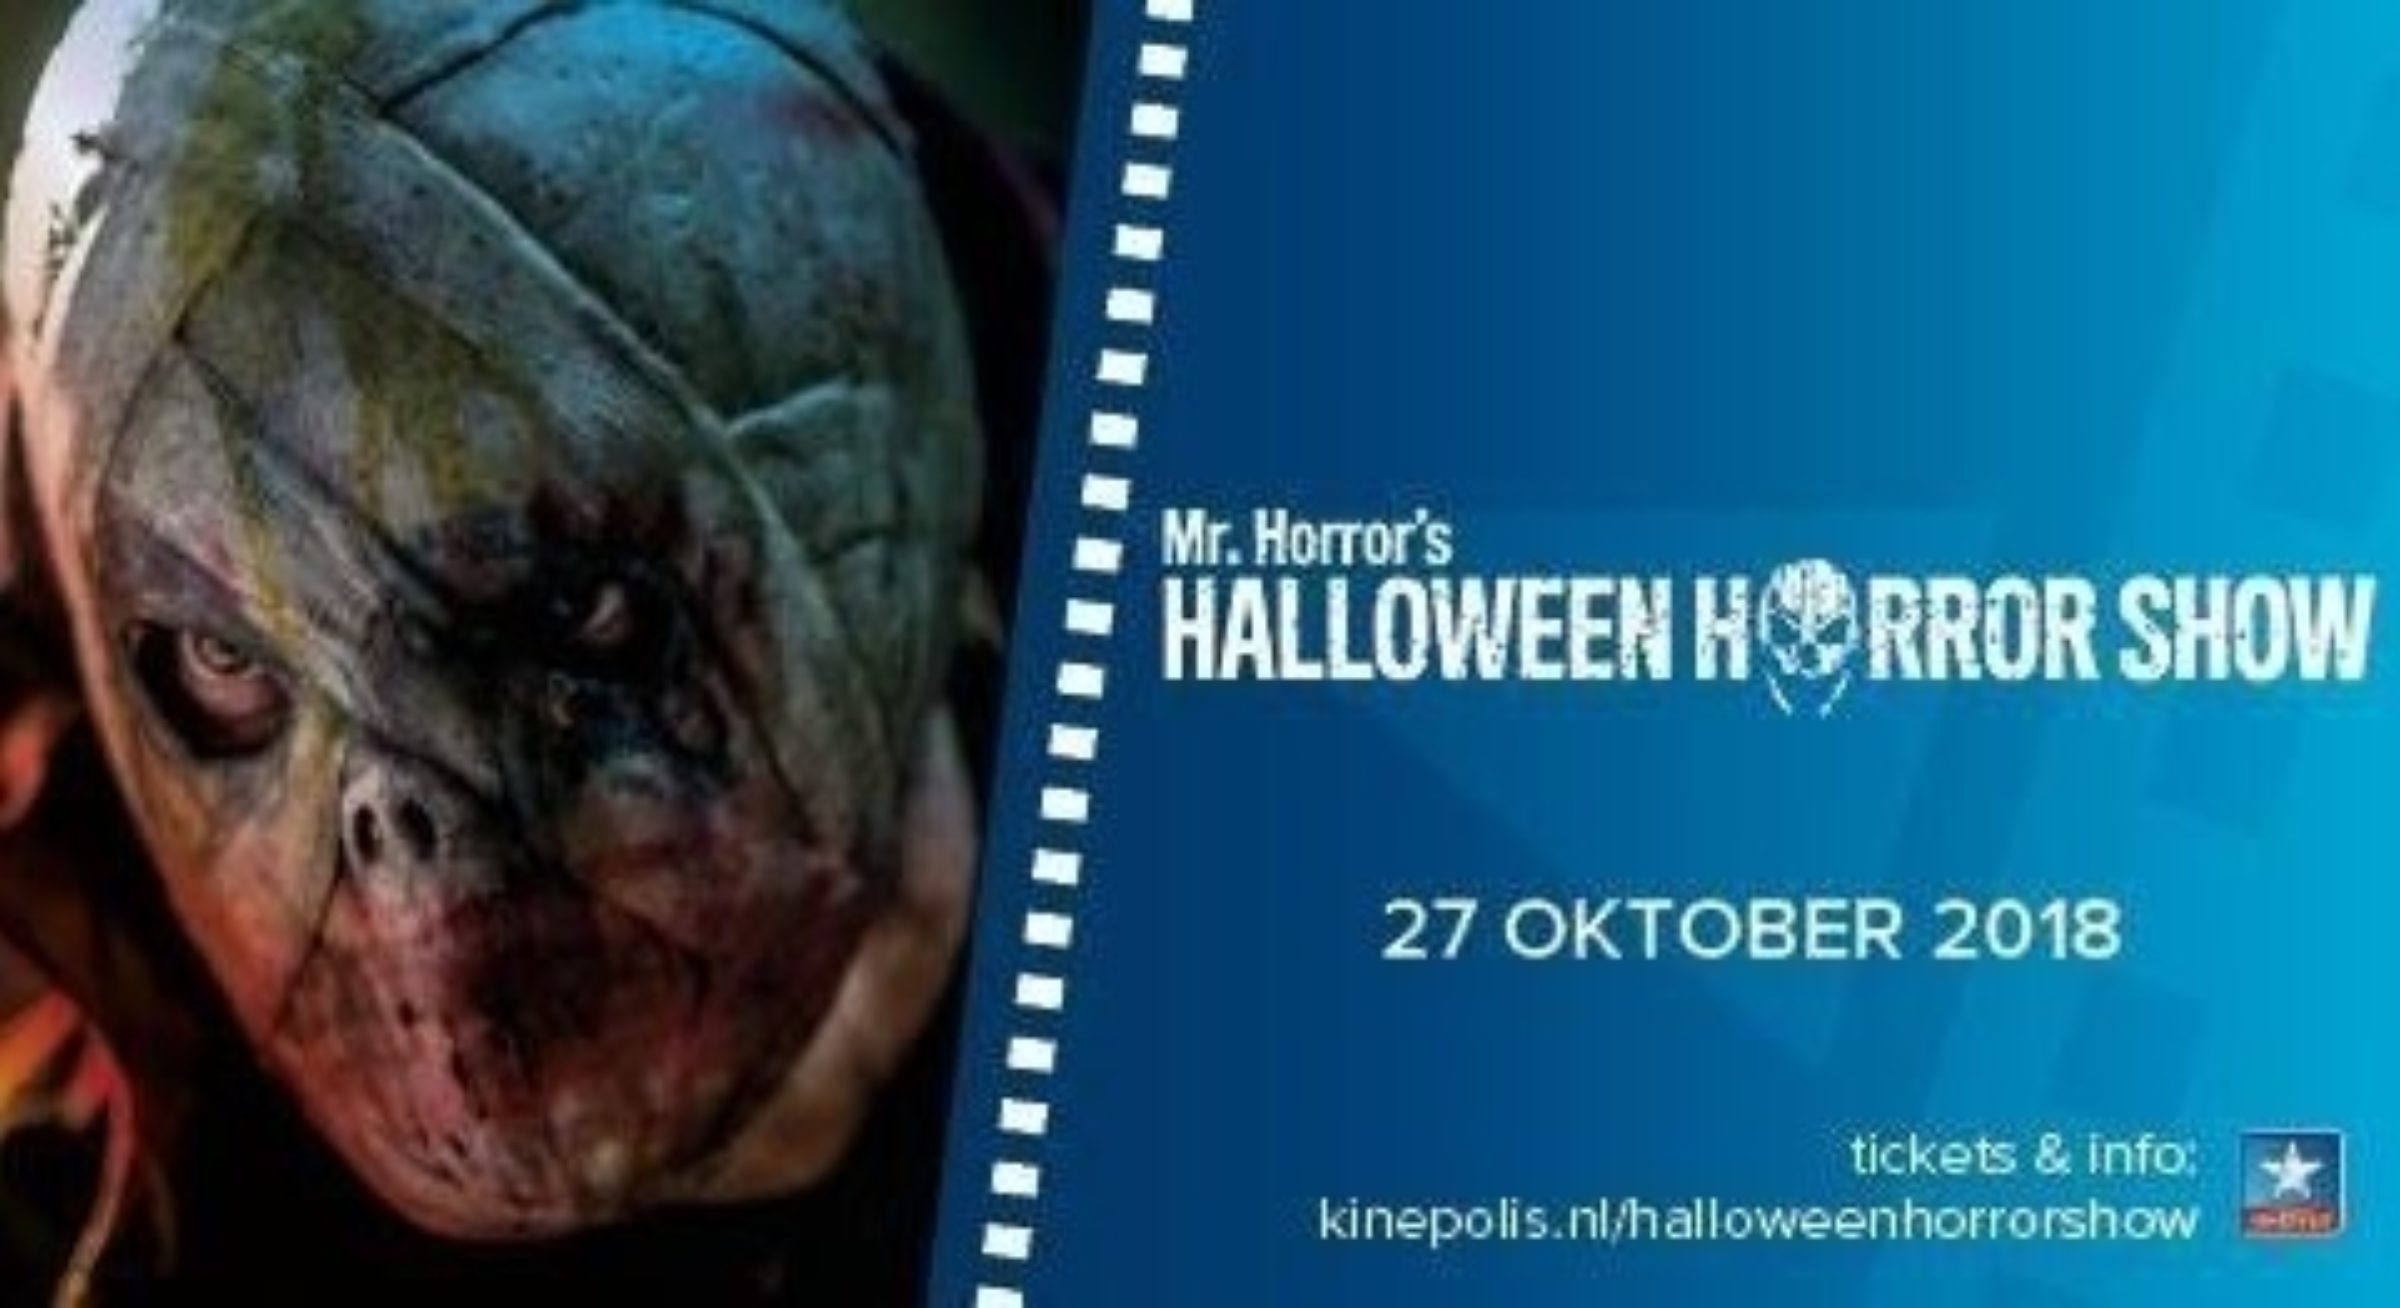 Horror night 1575 1539695779 35ht4m6ret